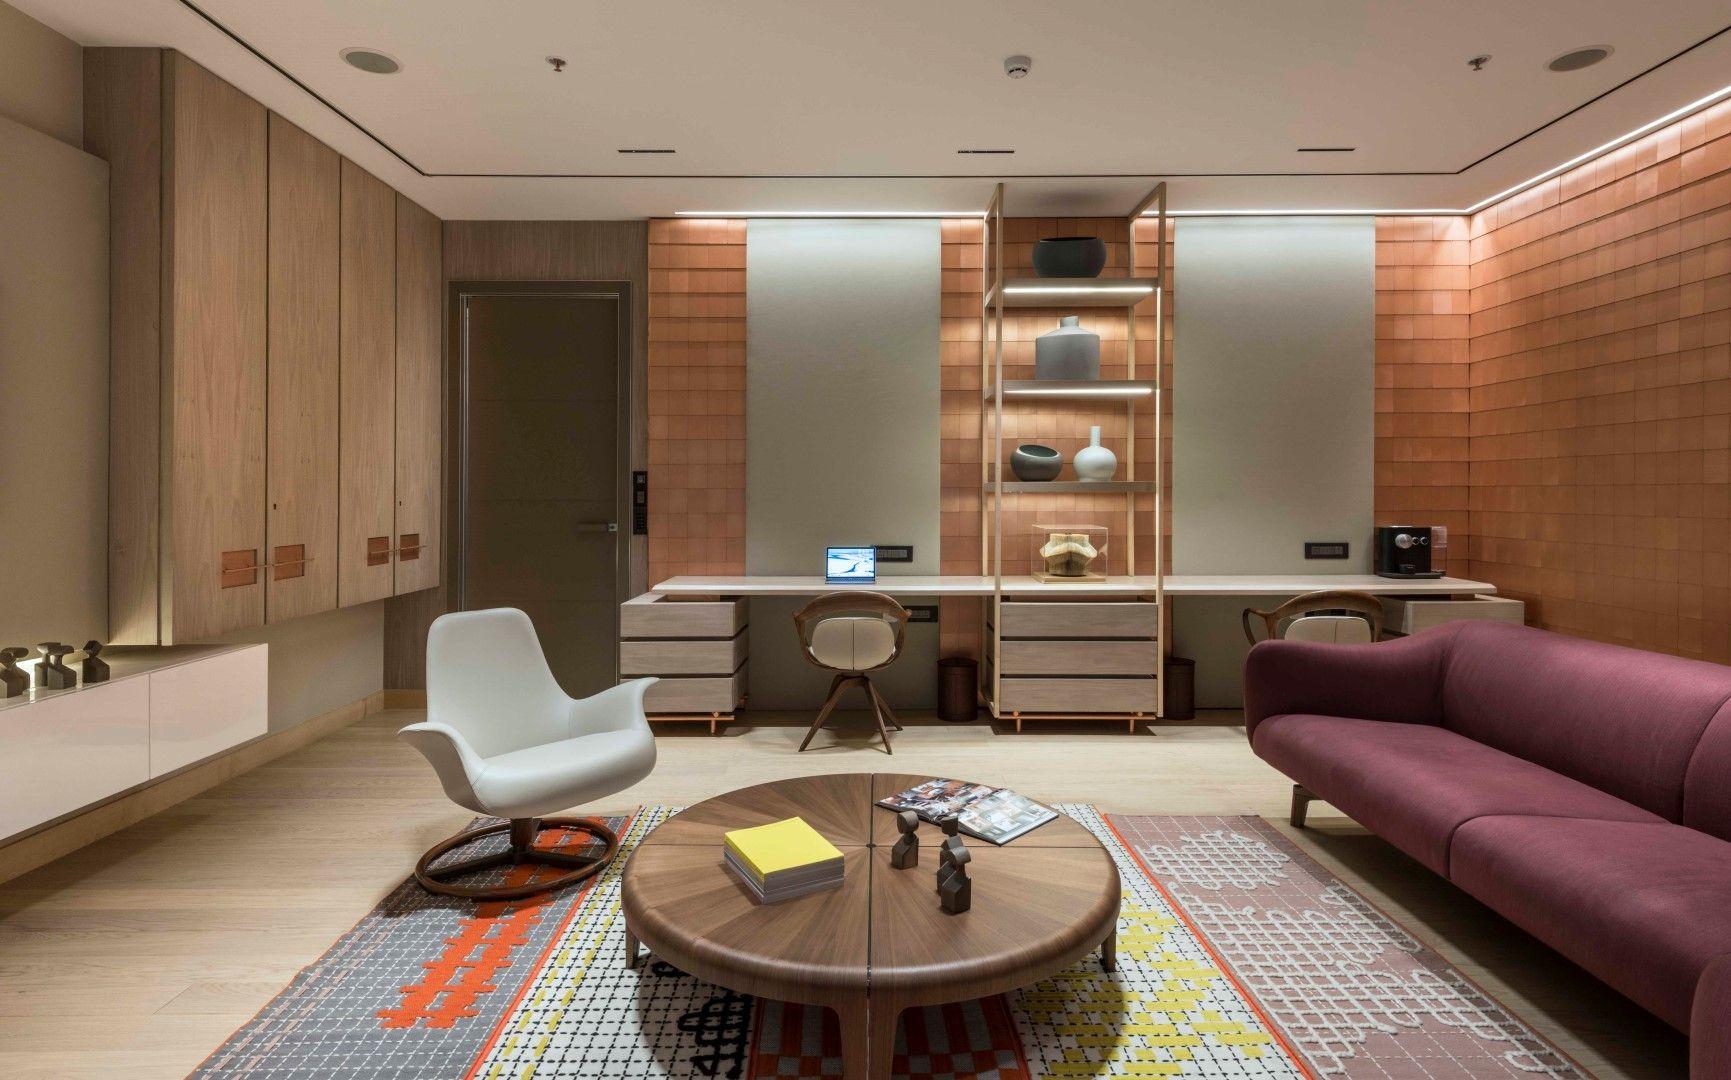 Subtle Yet Vibrant Office Design Vibrant Office Design Apartment Interior Design Interior Design Colleges